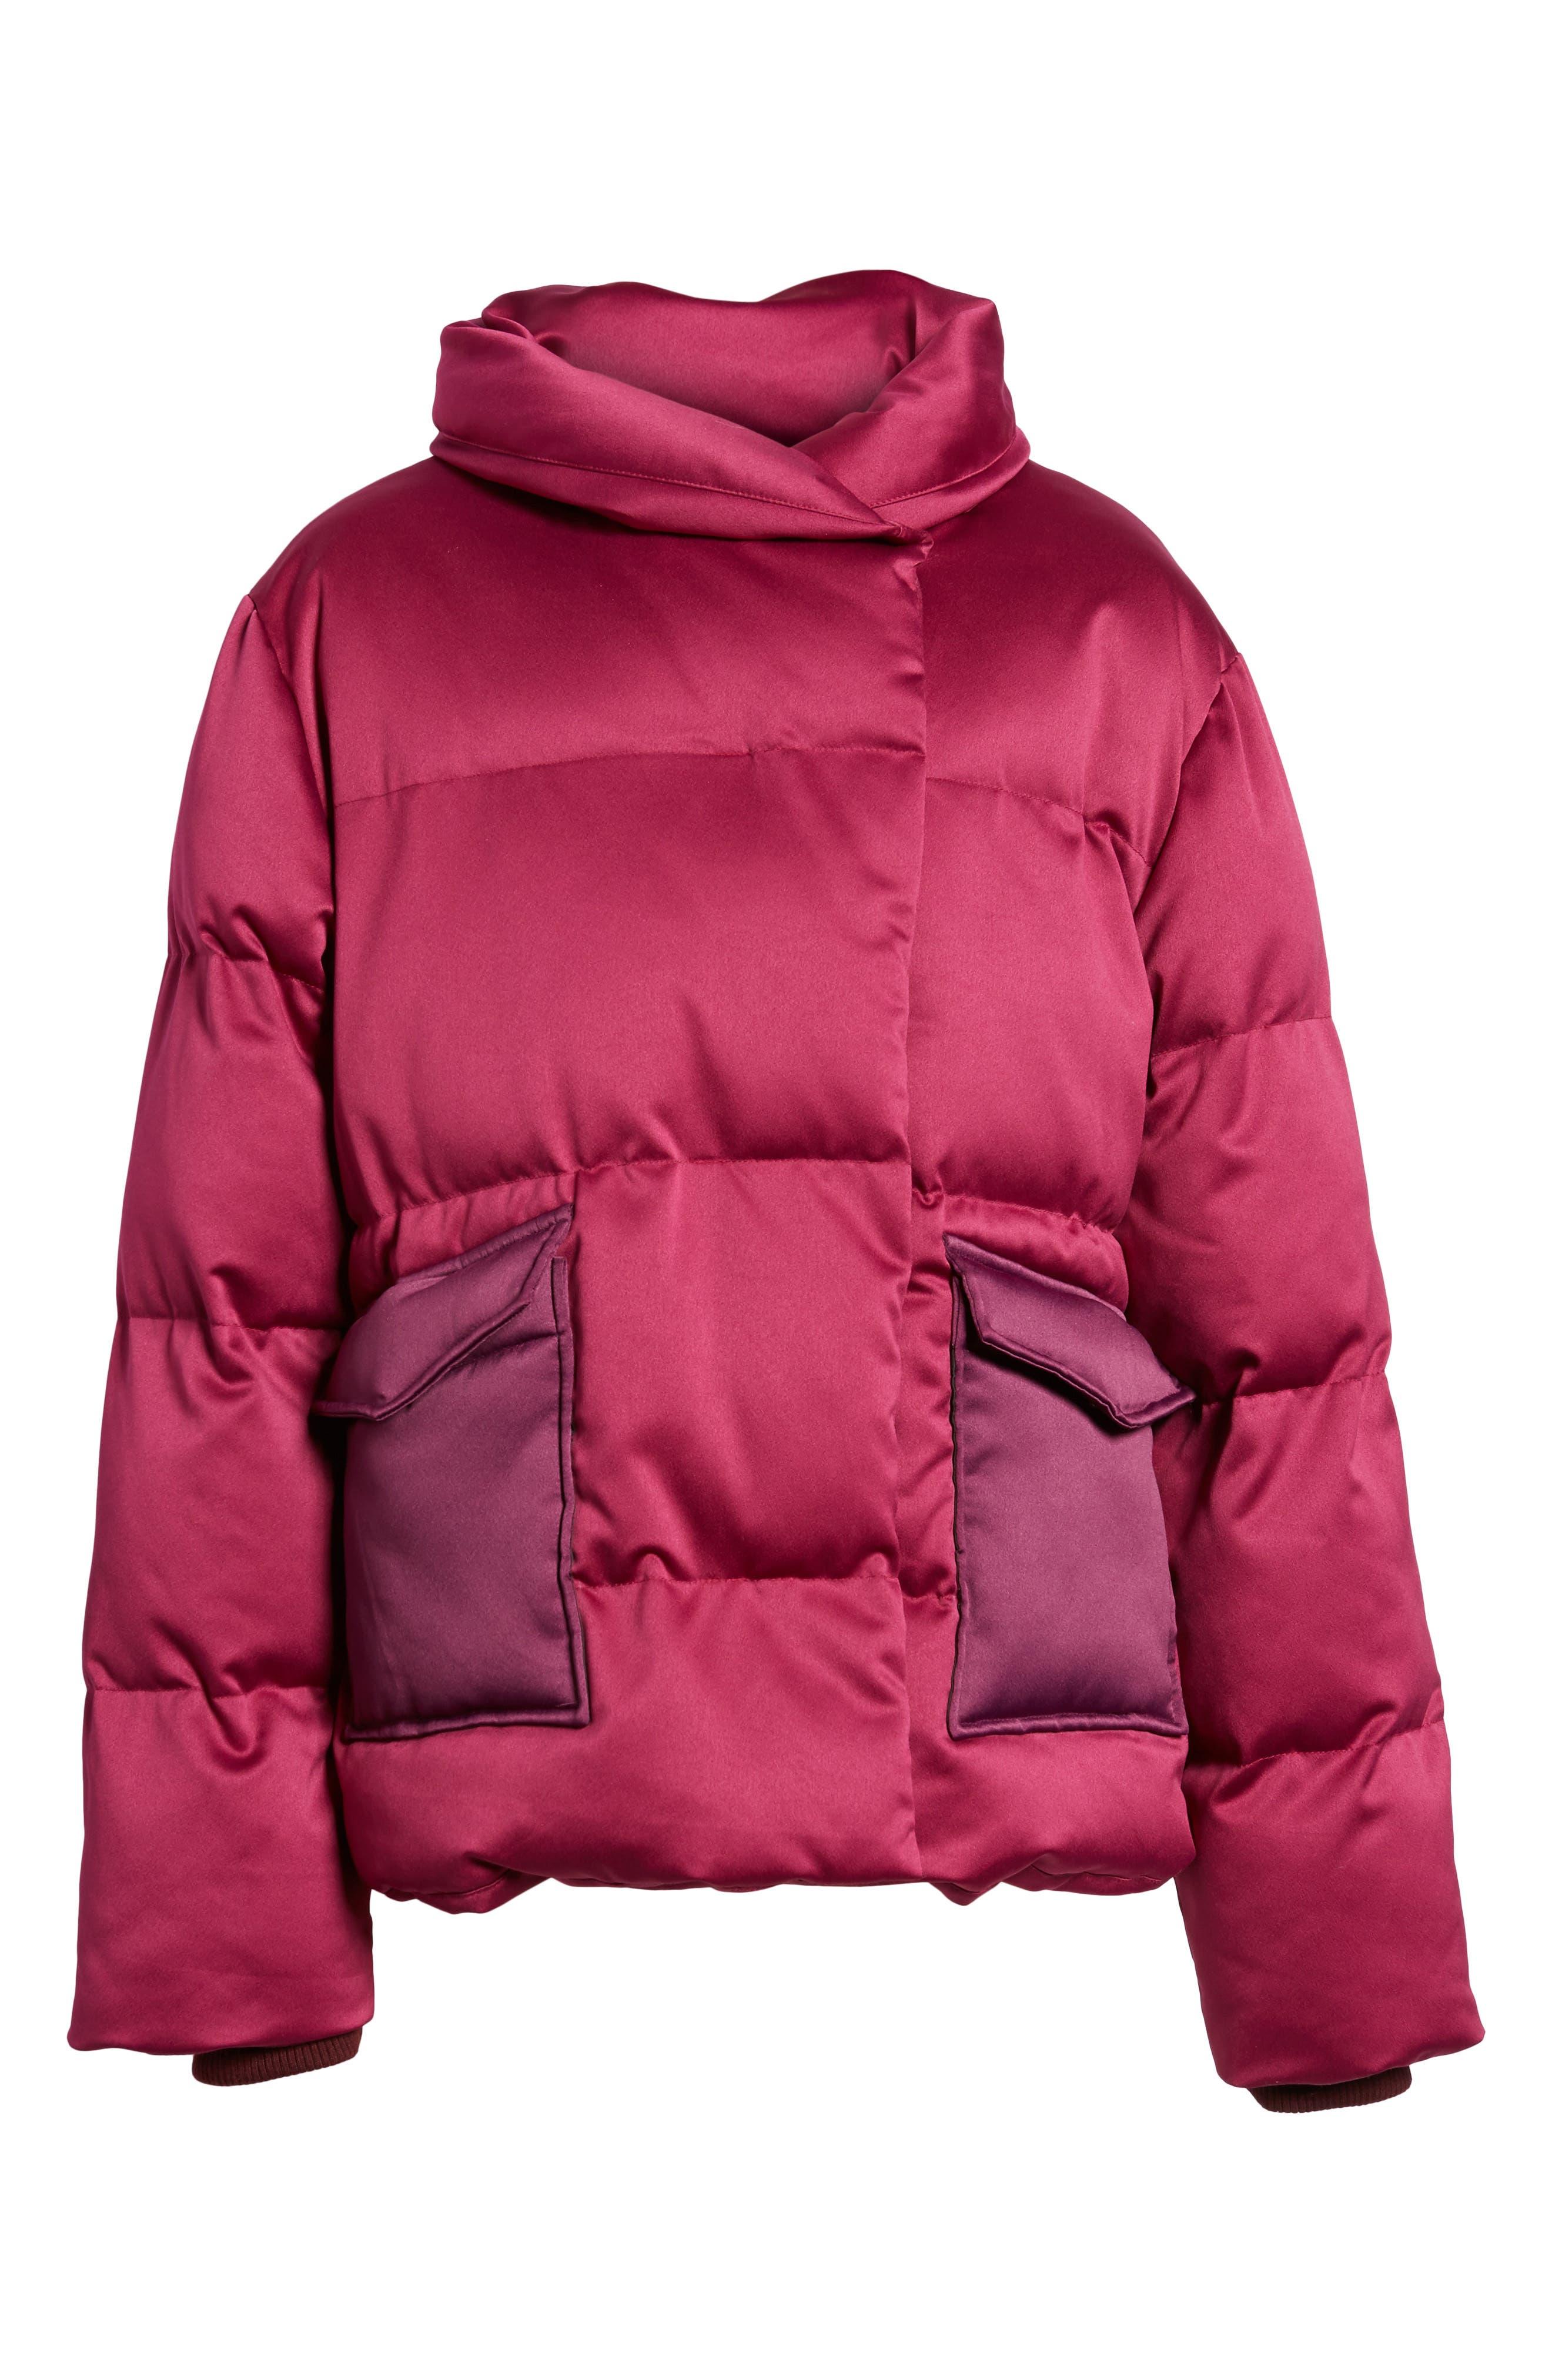 Satin Puffer Jacket,                             Alternate thumbnail 5, color,                             650